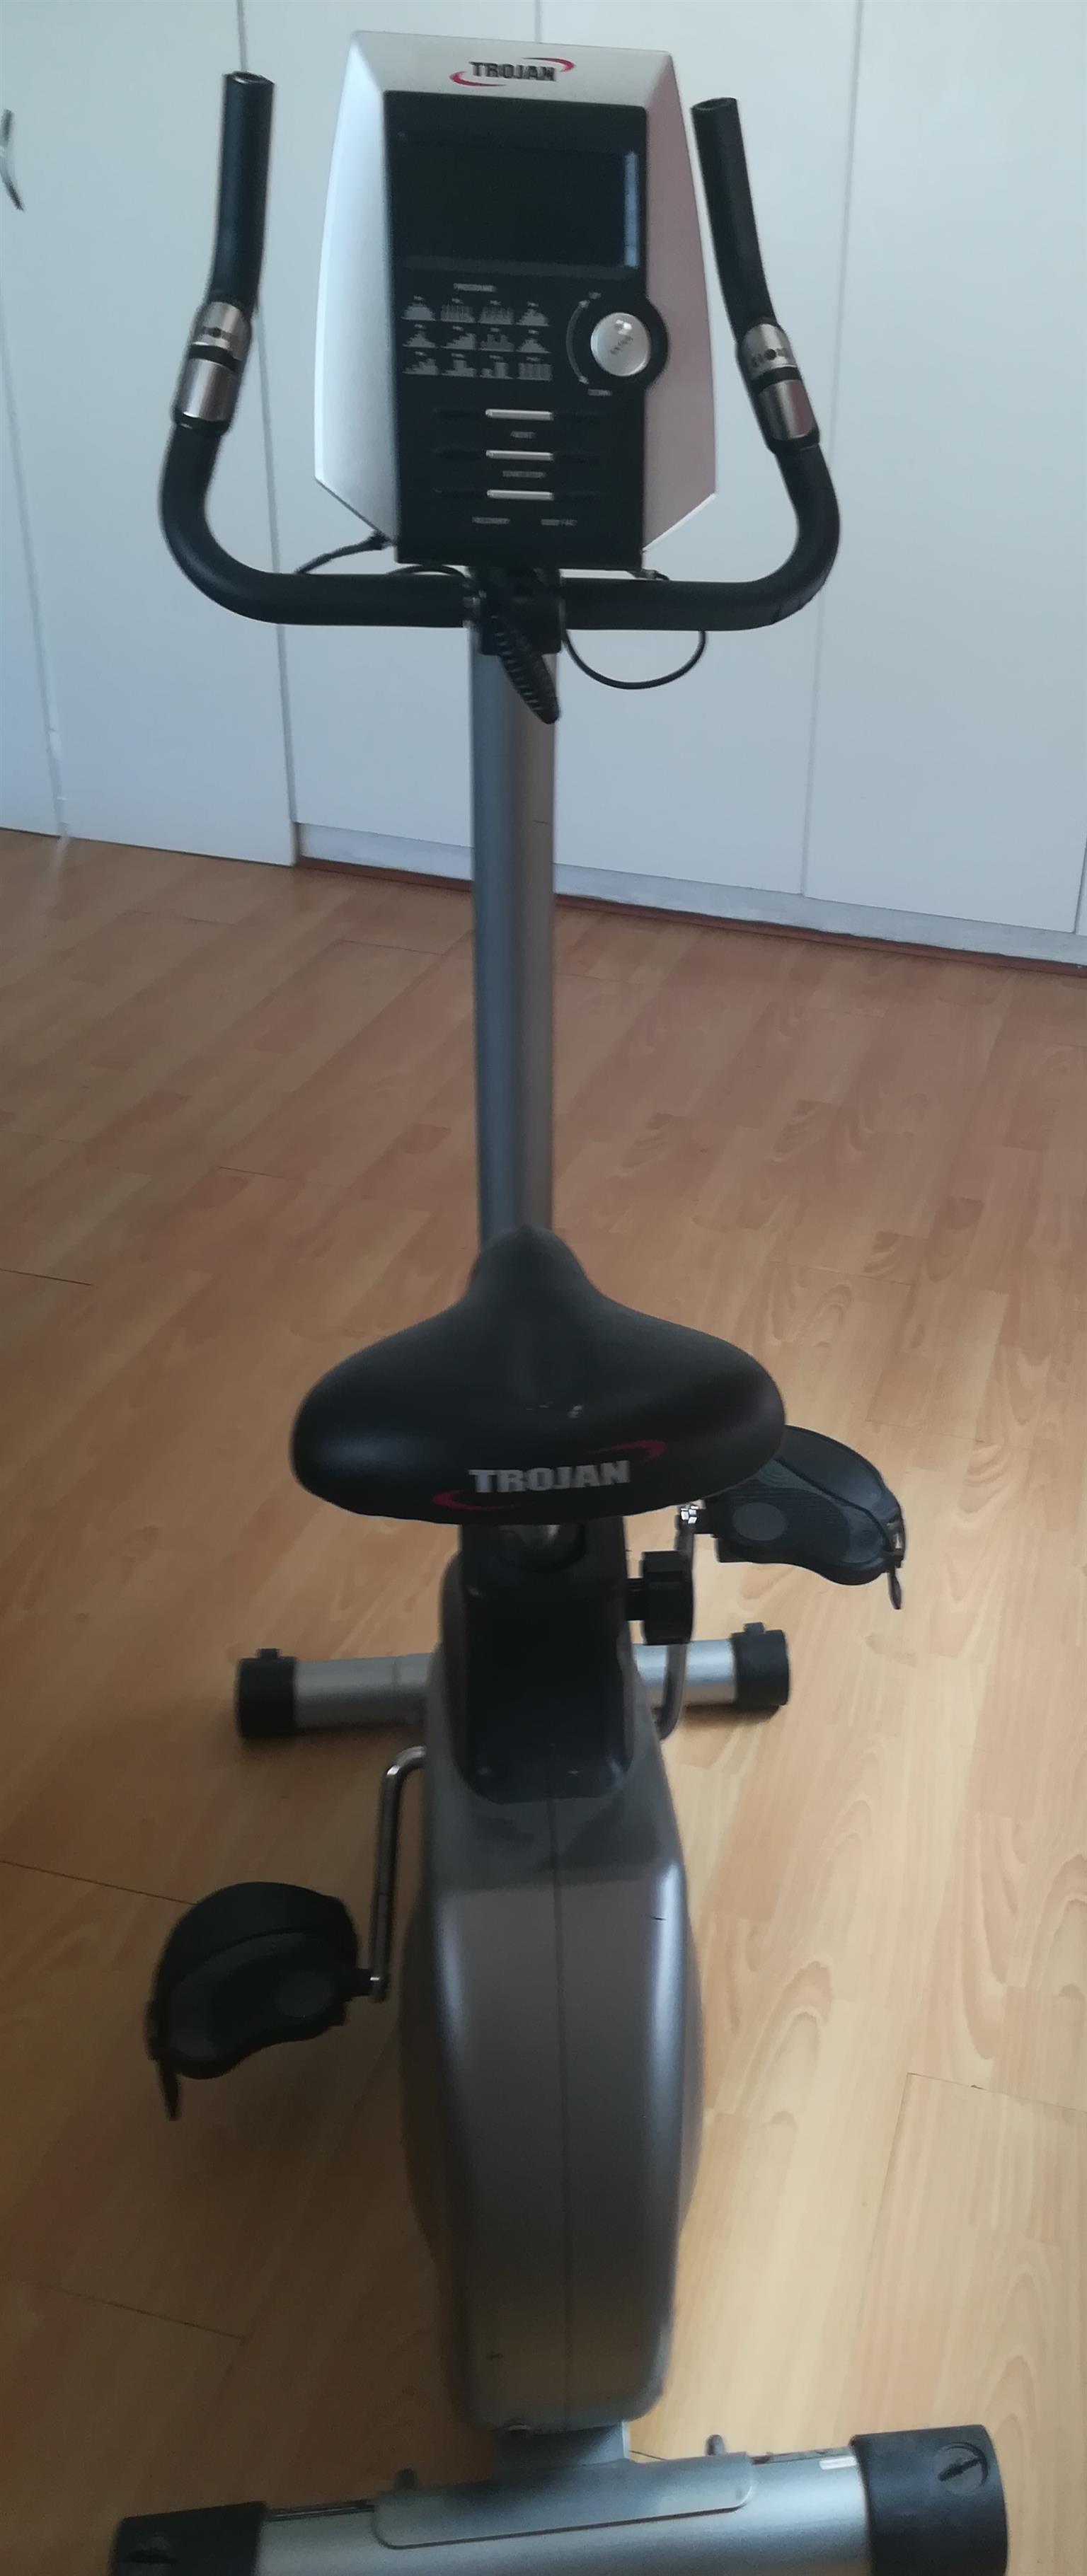 Trojan velocity 400 Bike for sale  - REDUCED